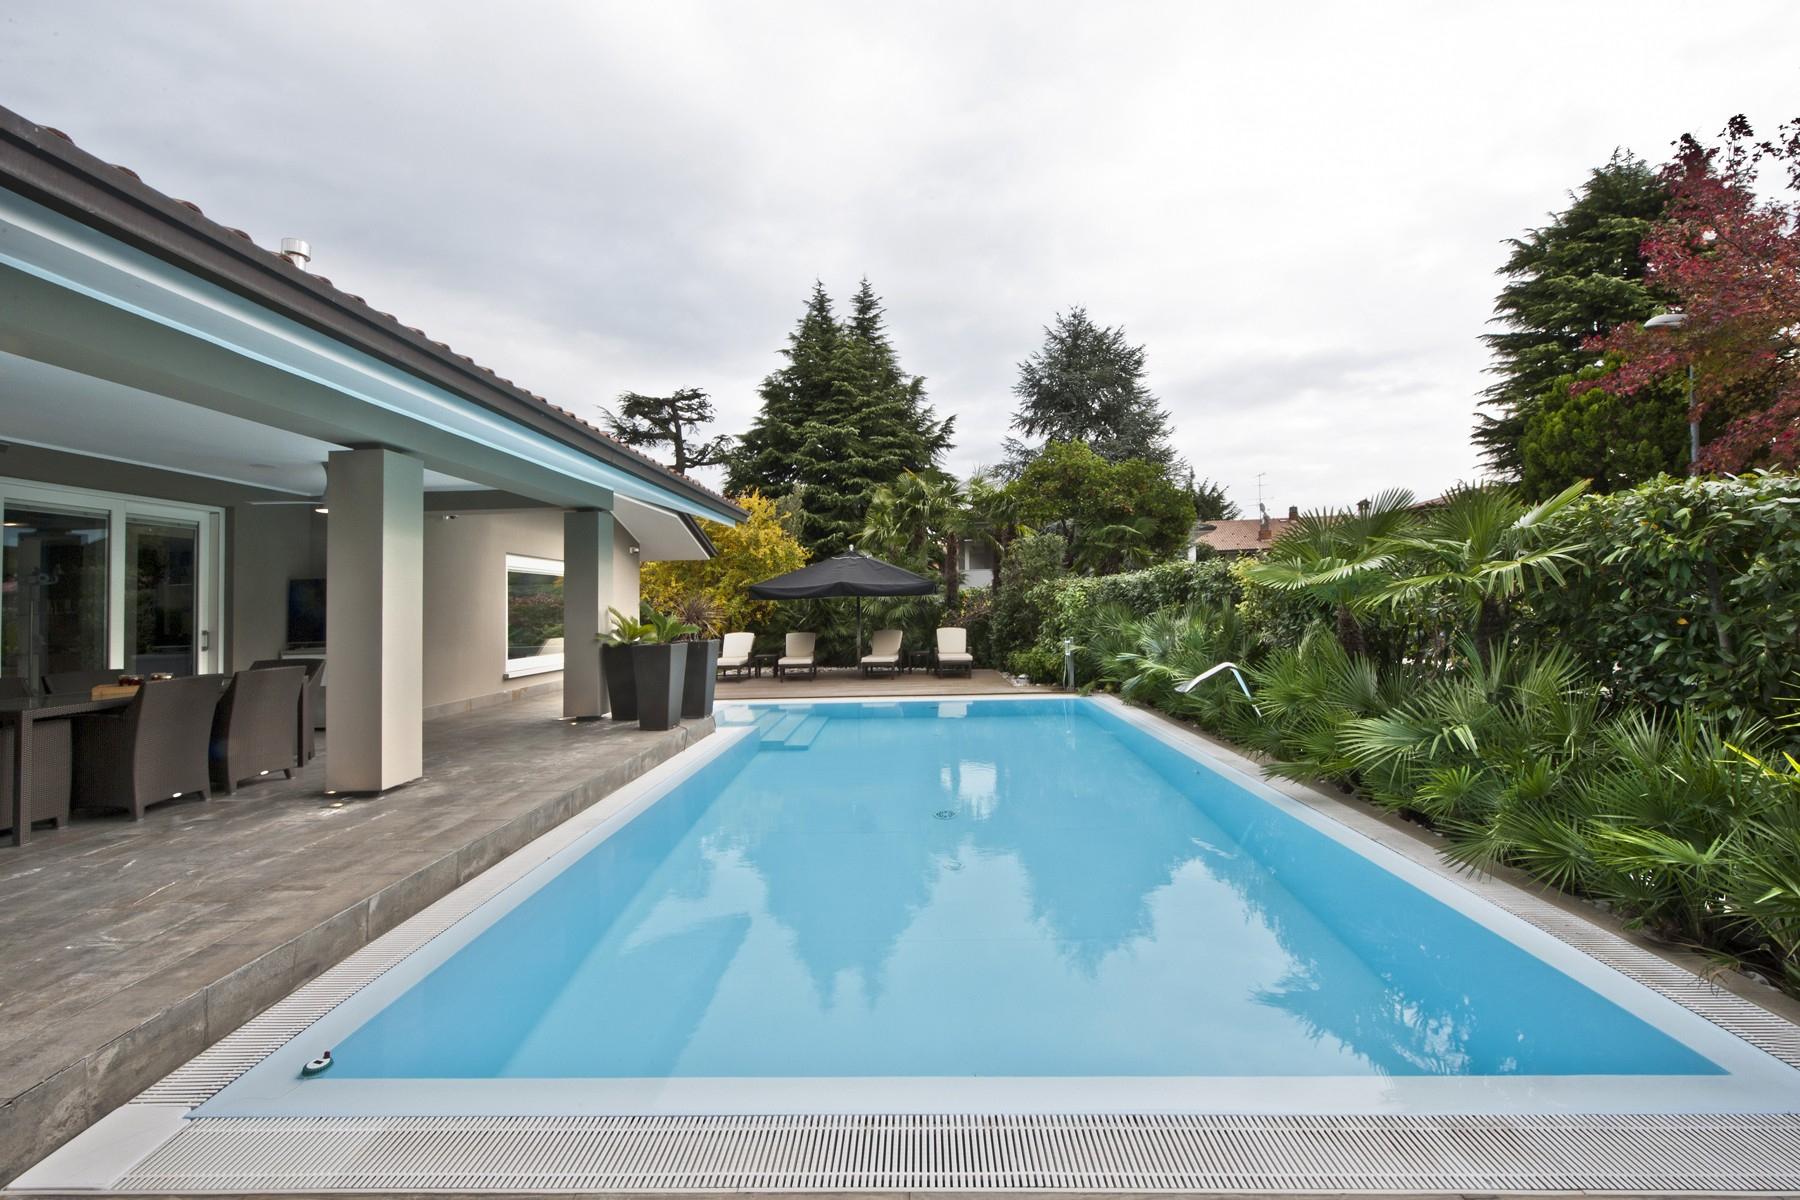 Villa in Vendita a Sirmione: 5 locali, 500 mq - Foto 19